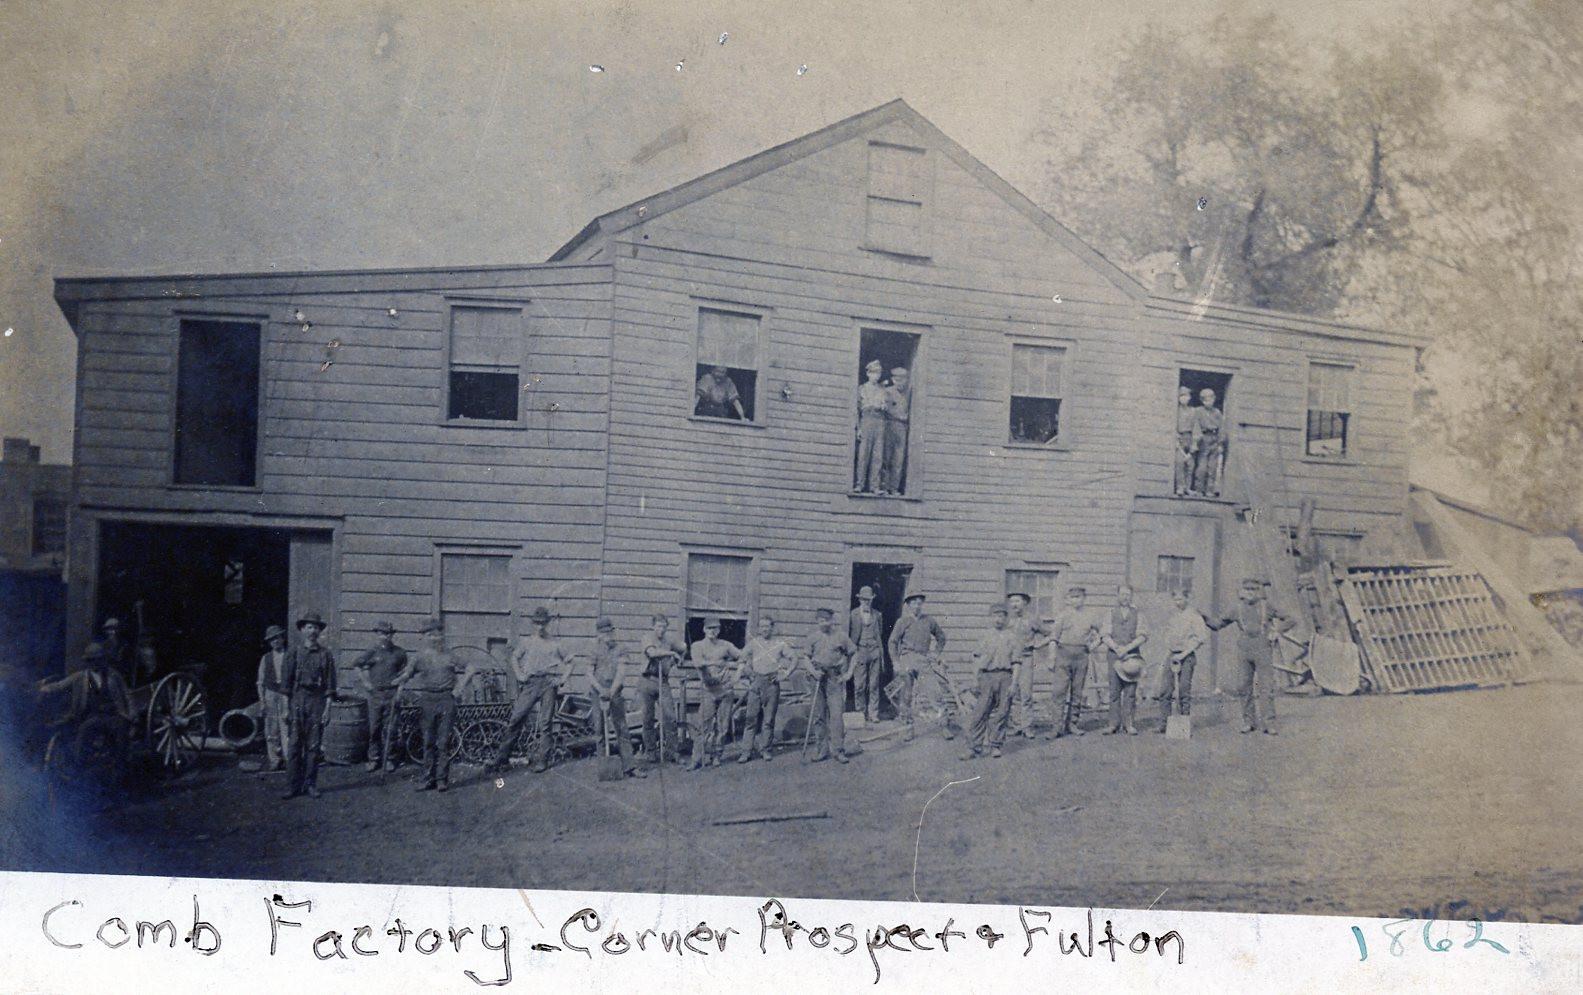 Comb Factory - Corner Prospect & Fulton